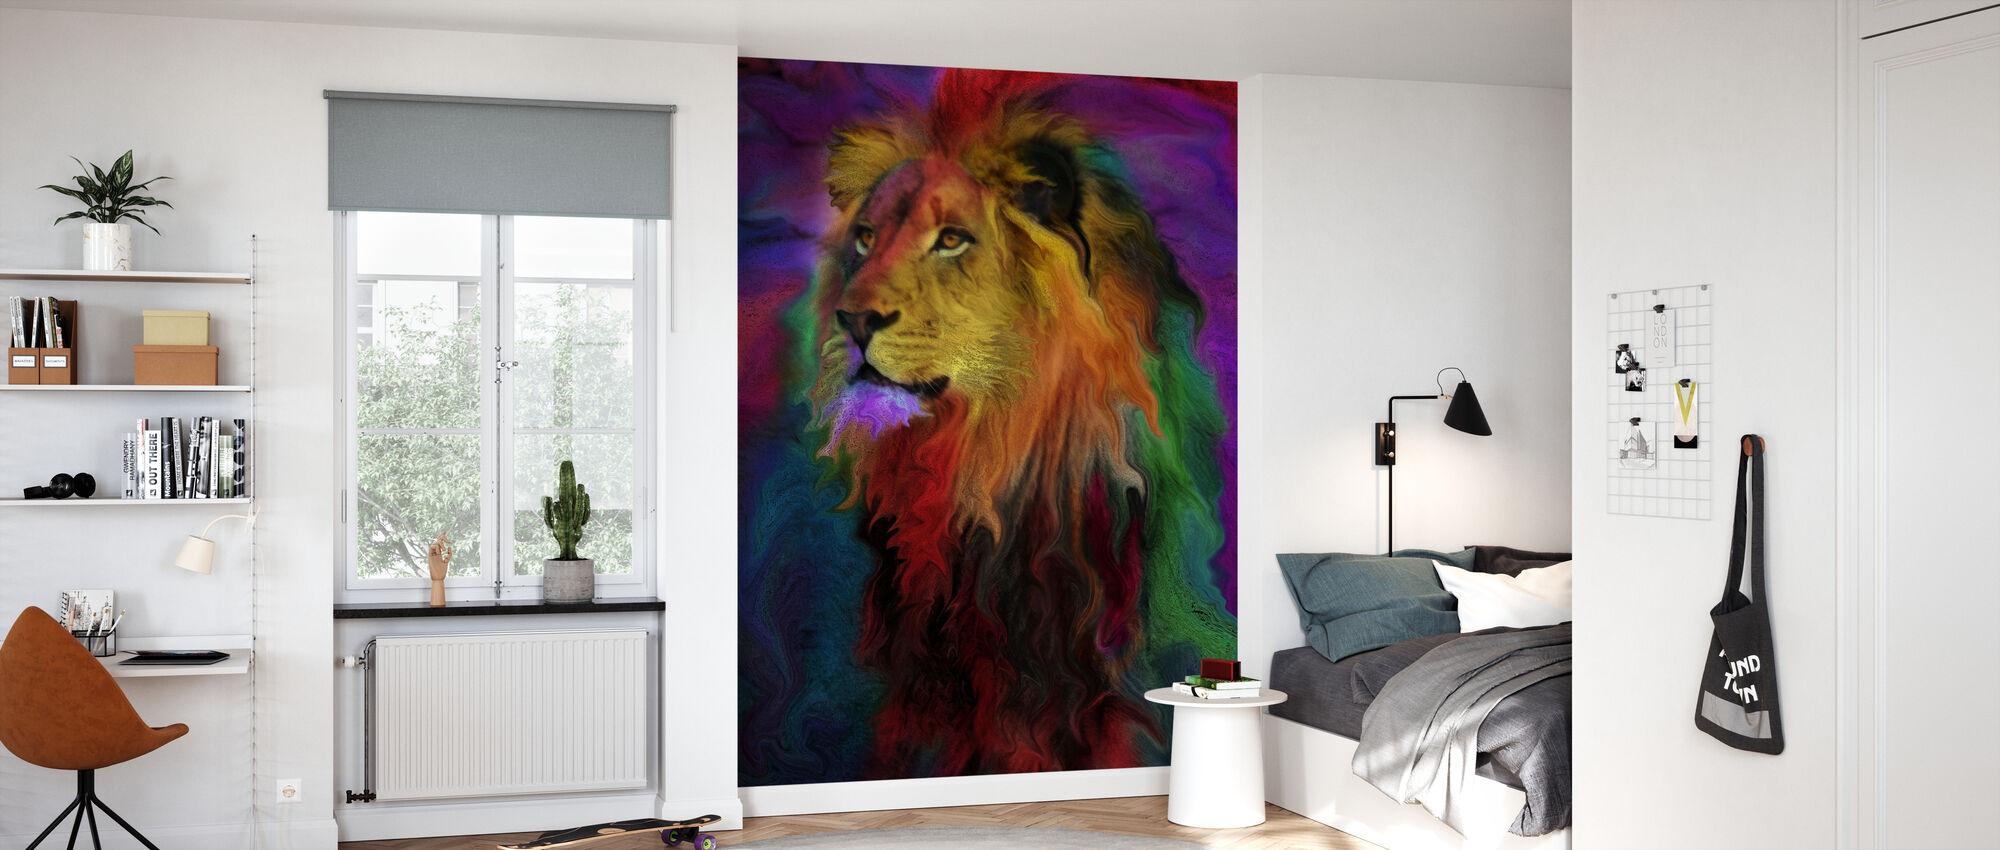 Rainbow løve - Tapet - Børneværelse